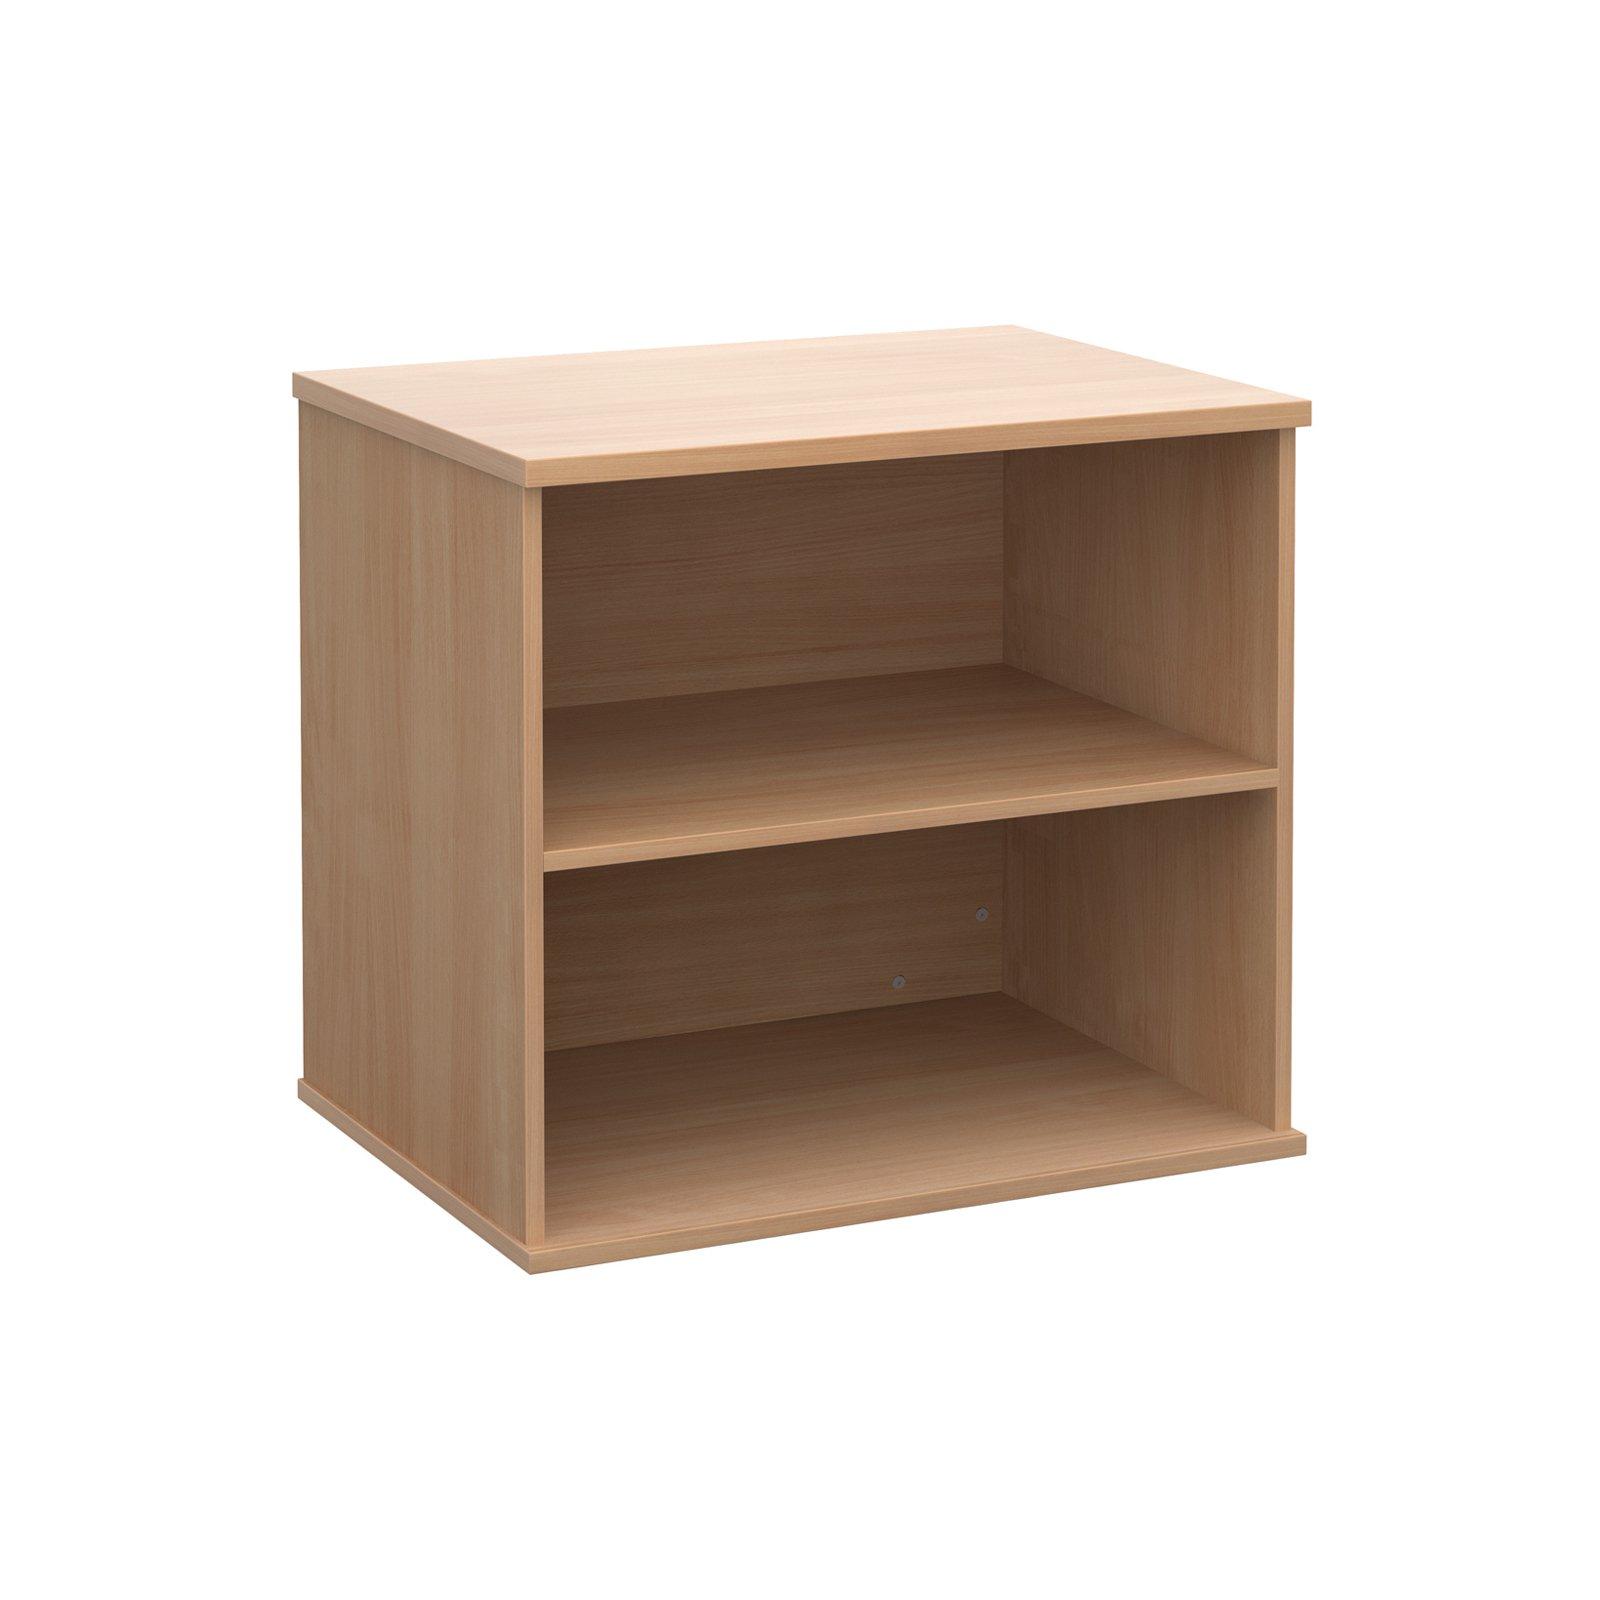 Dams Desk High Open Front Bookcase With 1 Shelf Beech